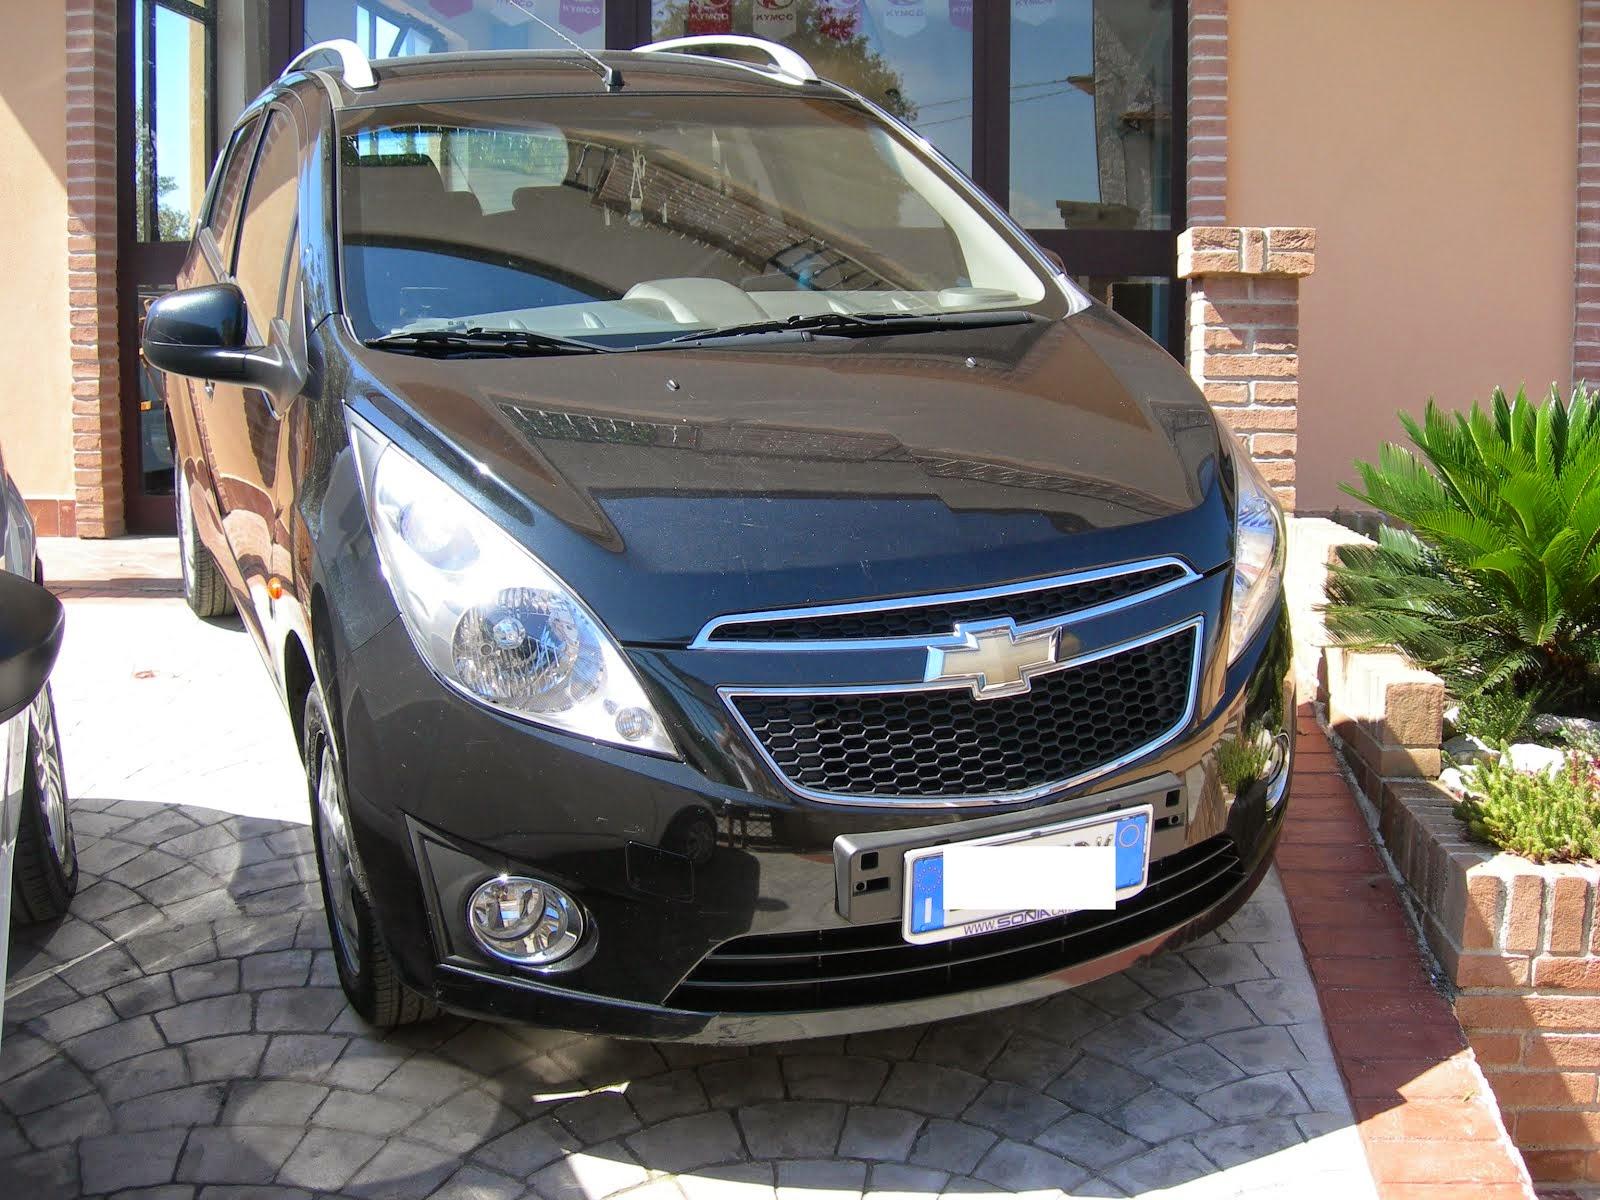 Chevrolet Spark 1.2 anno 2011 50.000 km acc: full optional 6.5000,00 euro